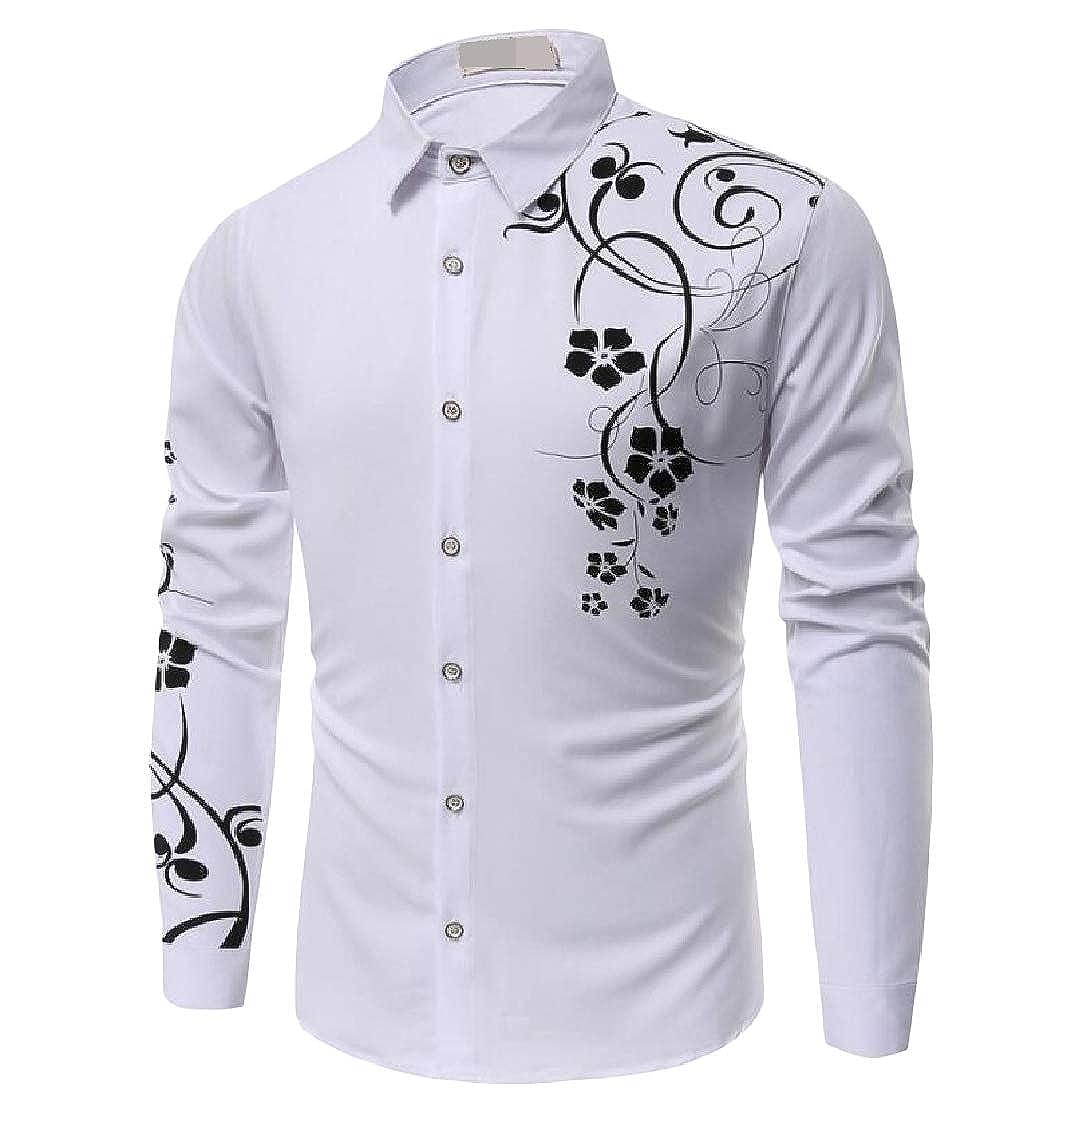 pipigo Men Basic Long Sleeve Solid Embroidery Button Down Shirt